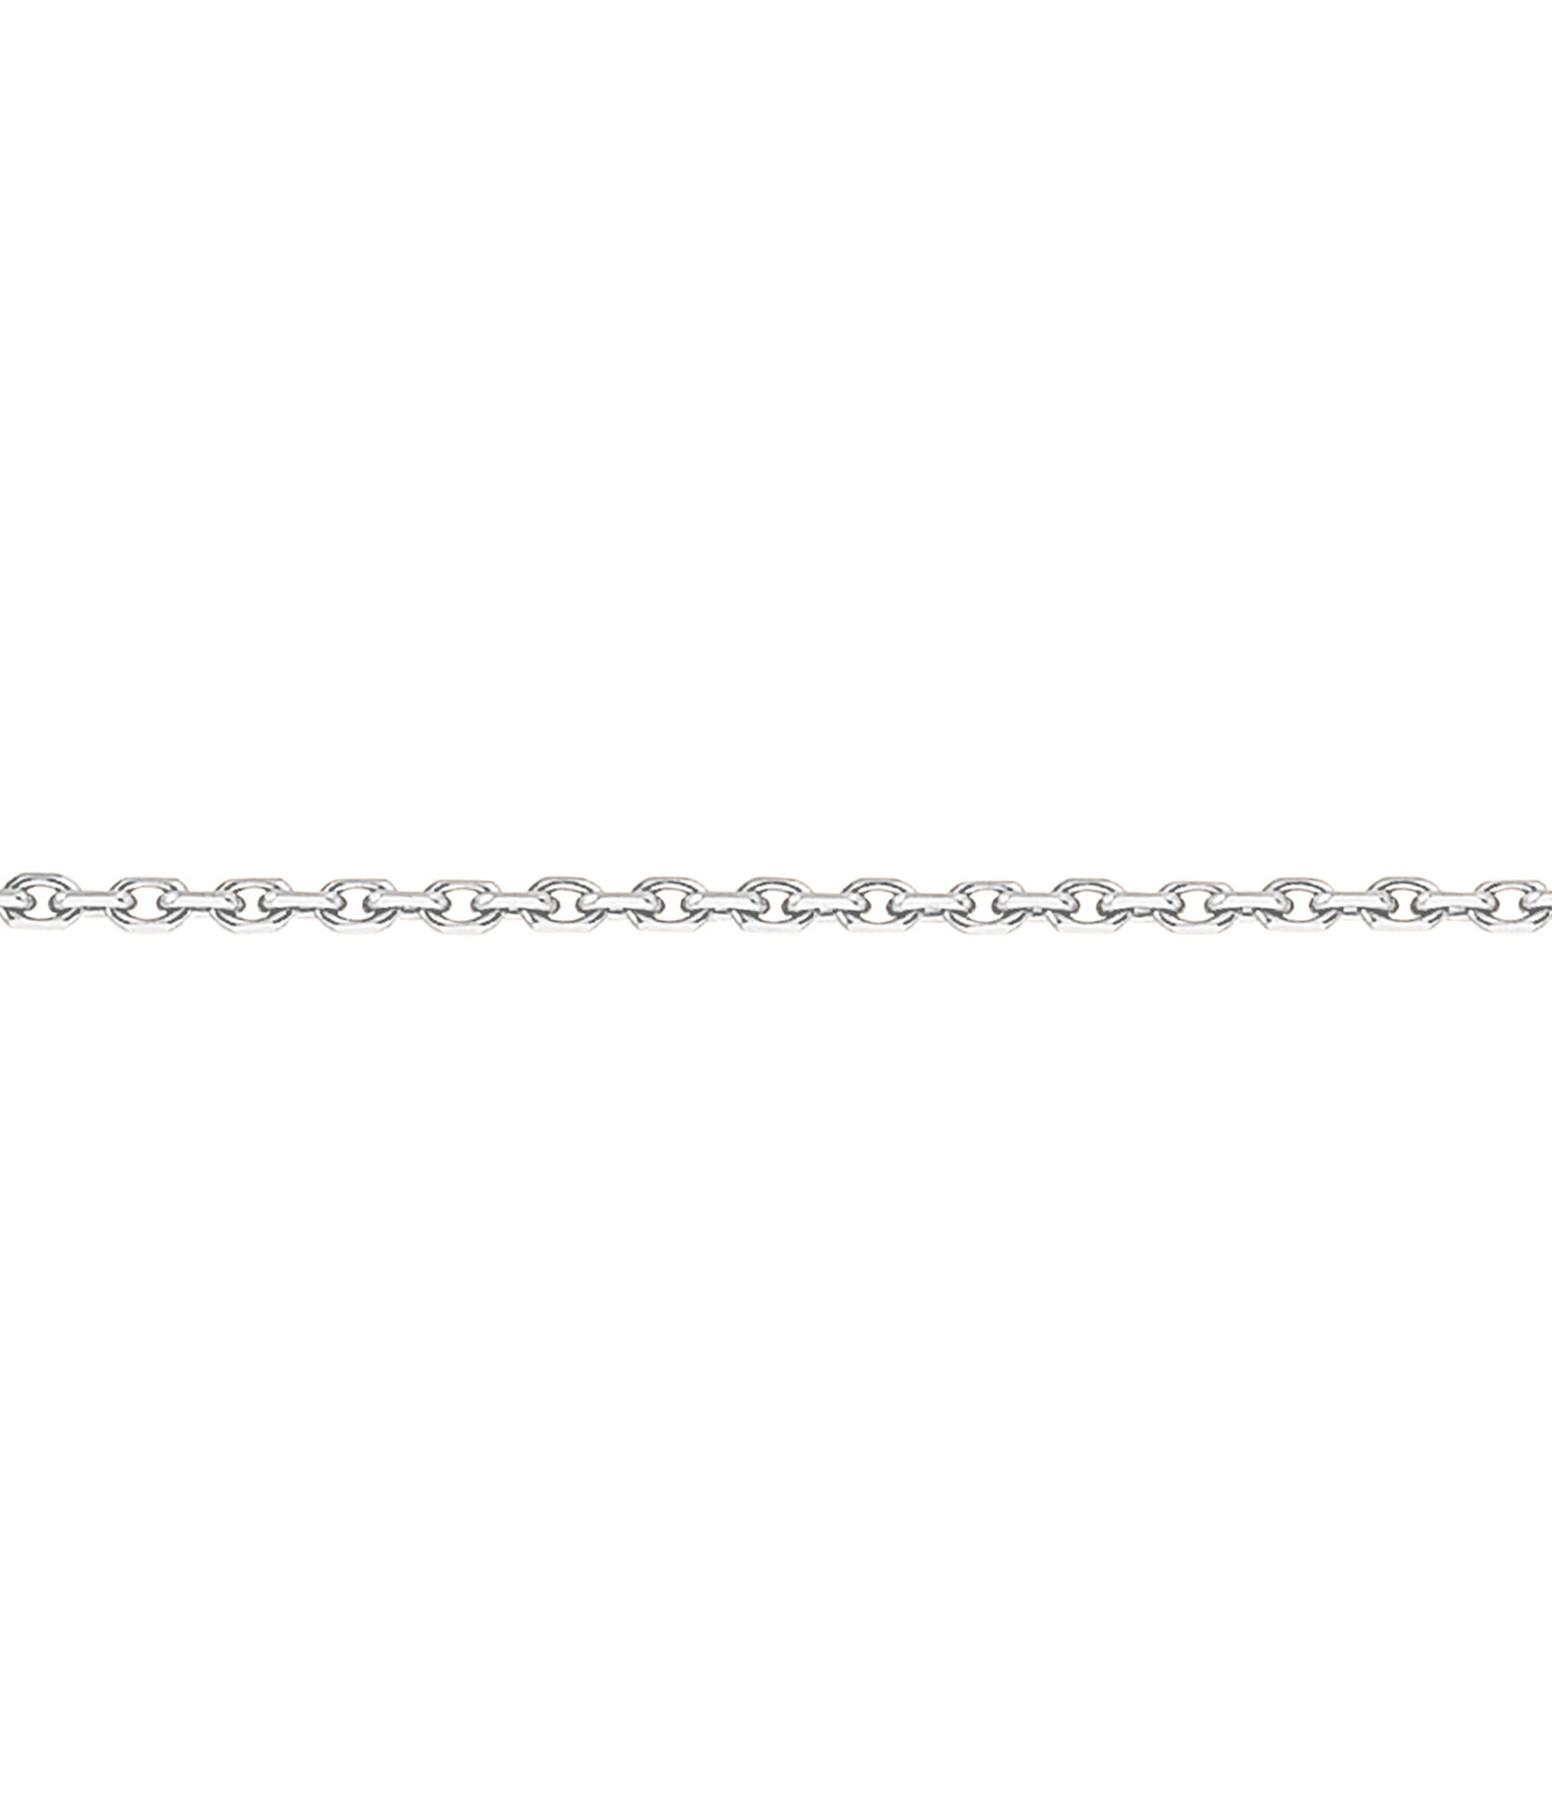 Chaîne Forçat Diamantée 55 cm - Stone